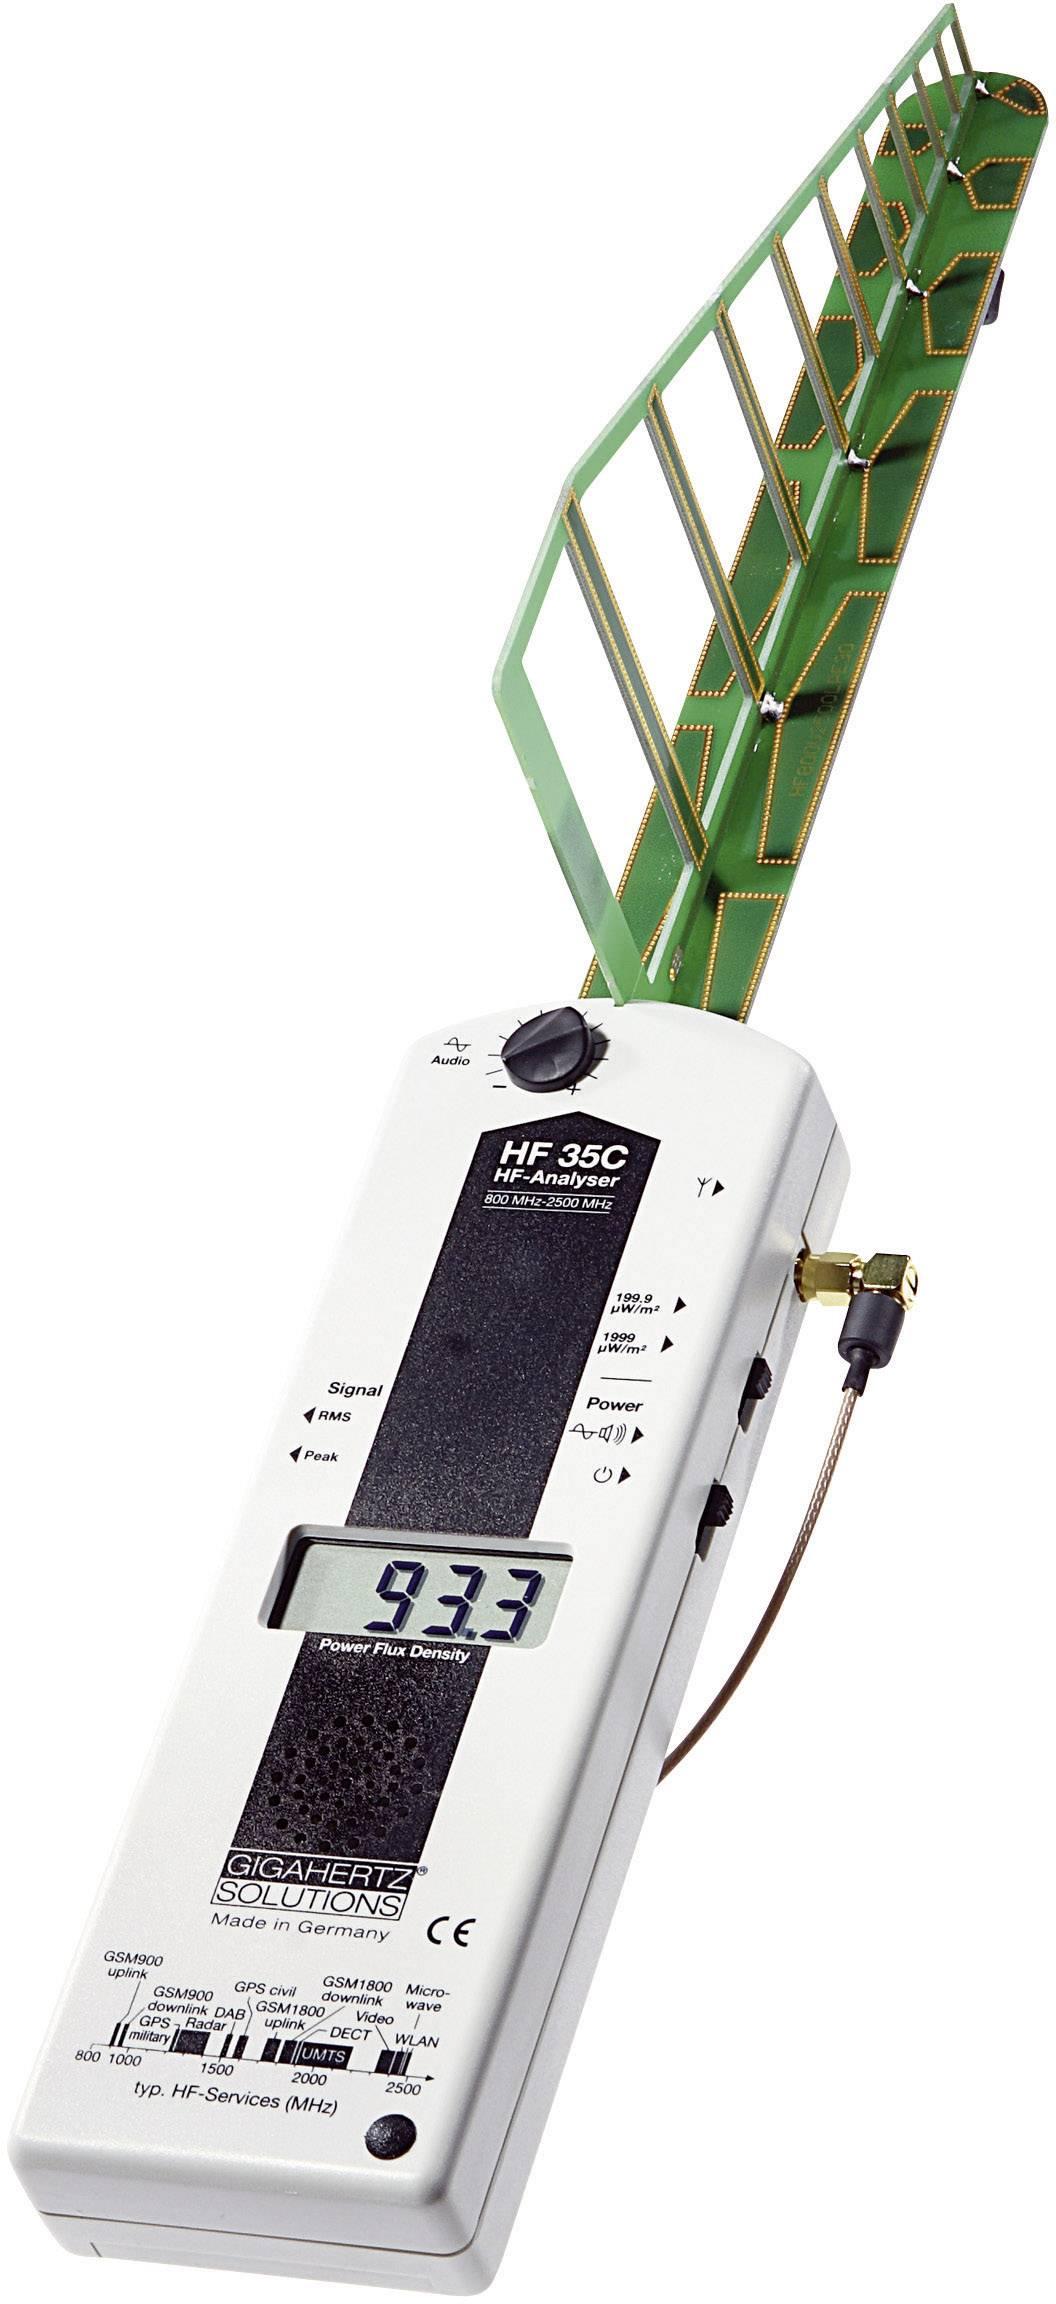 VF analyzátor Gigahertz Solutions HF35C pro měření elektrosmogu, 800 MHz - 2,7 GHz